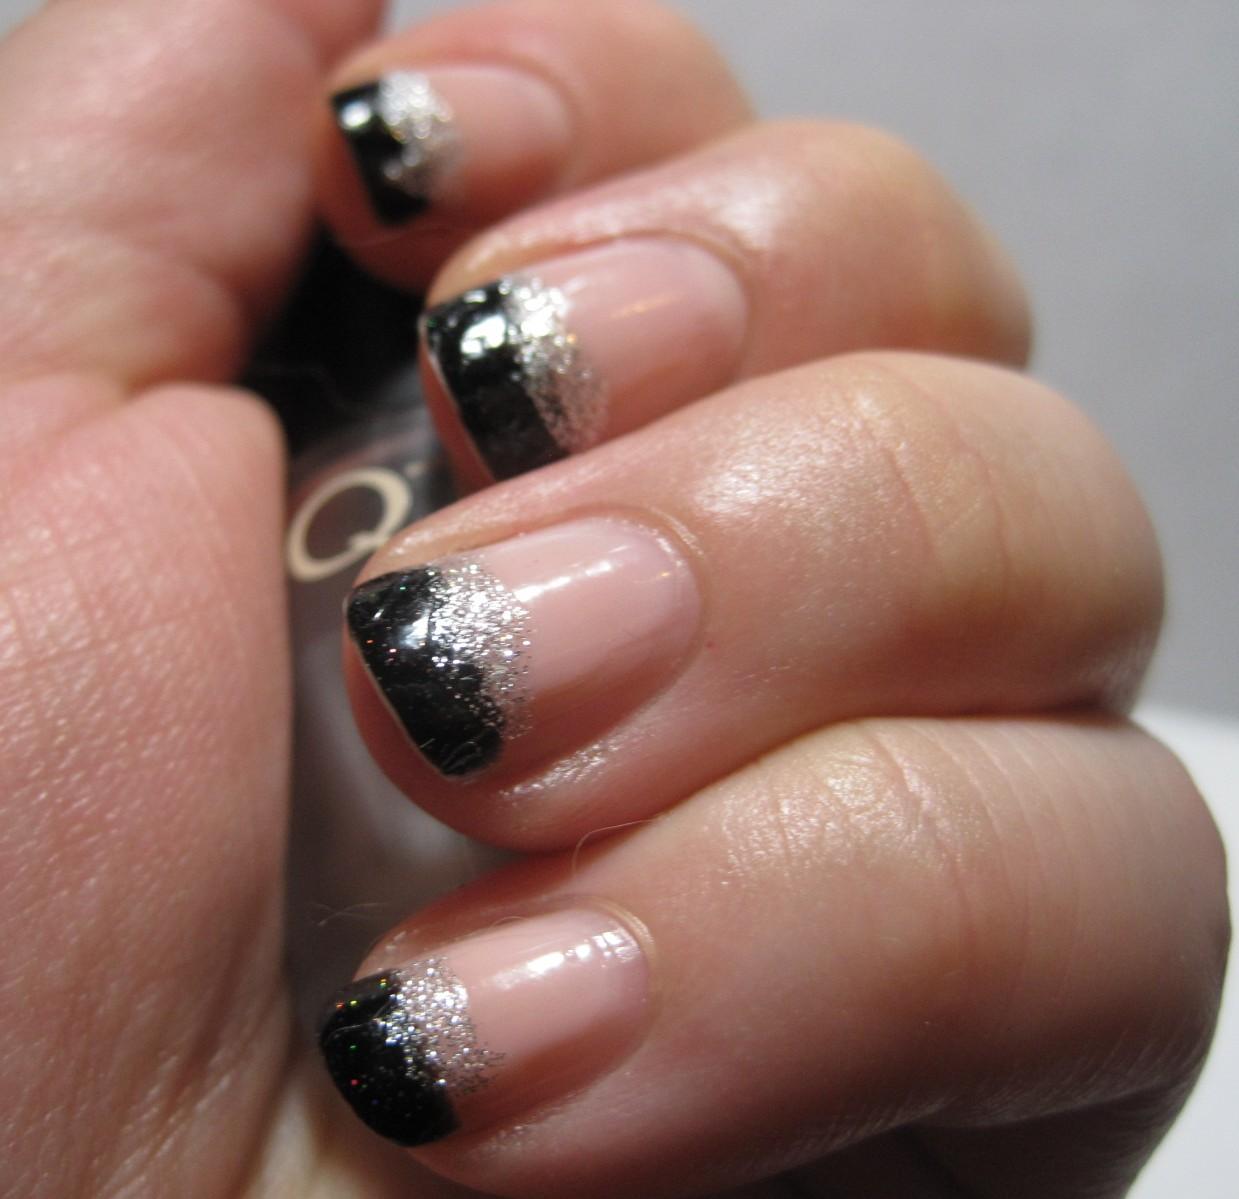 Fantastic Black French Tip Nails Motif - Nail Art Design Ideas ...